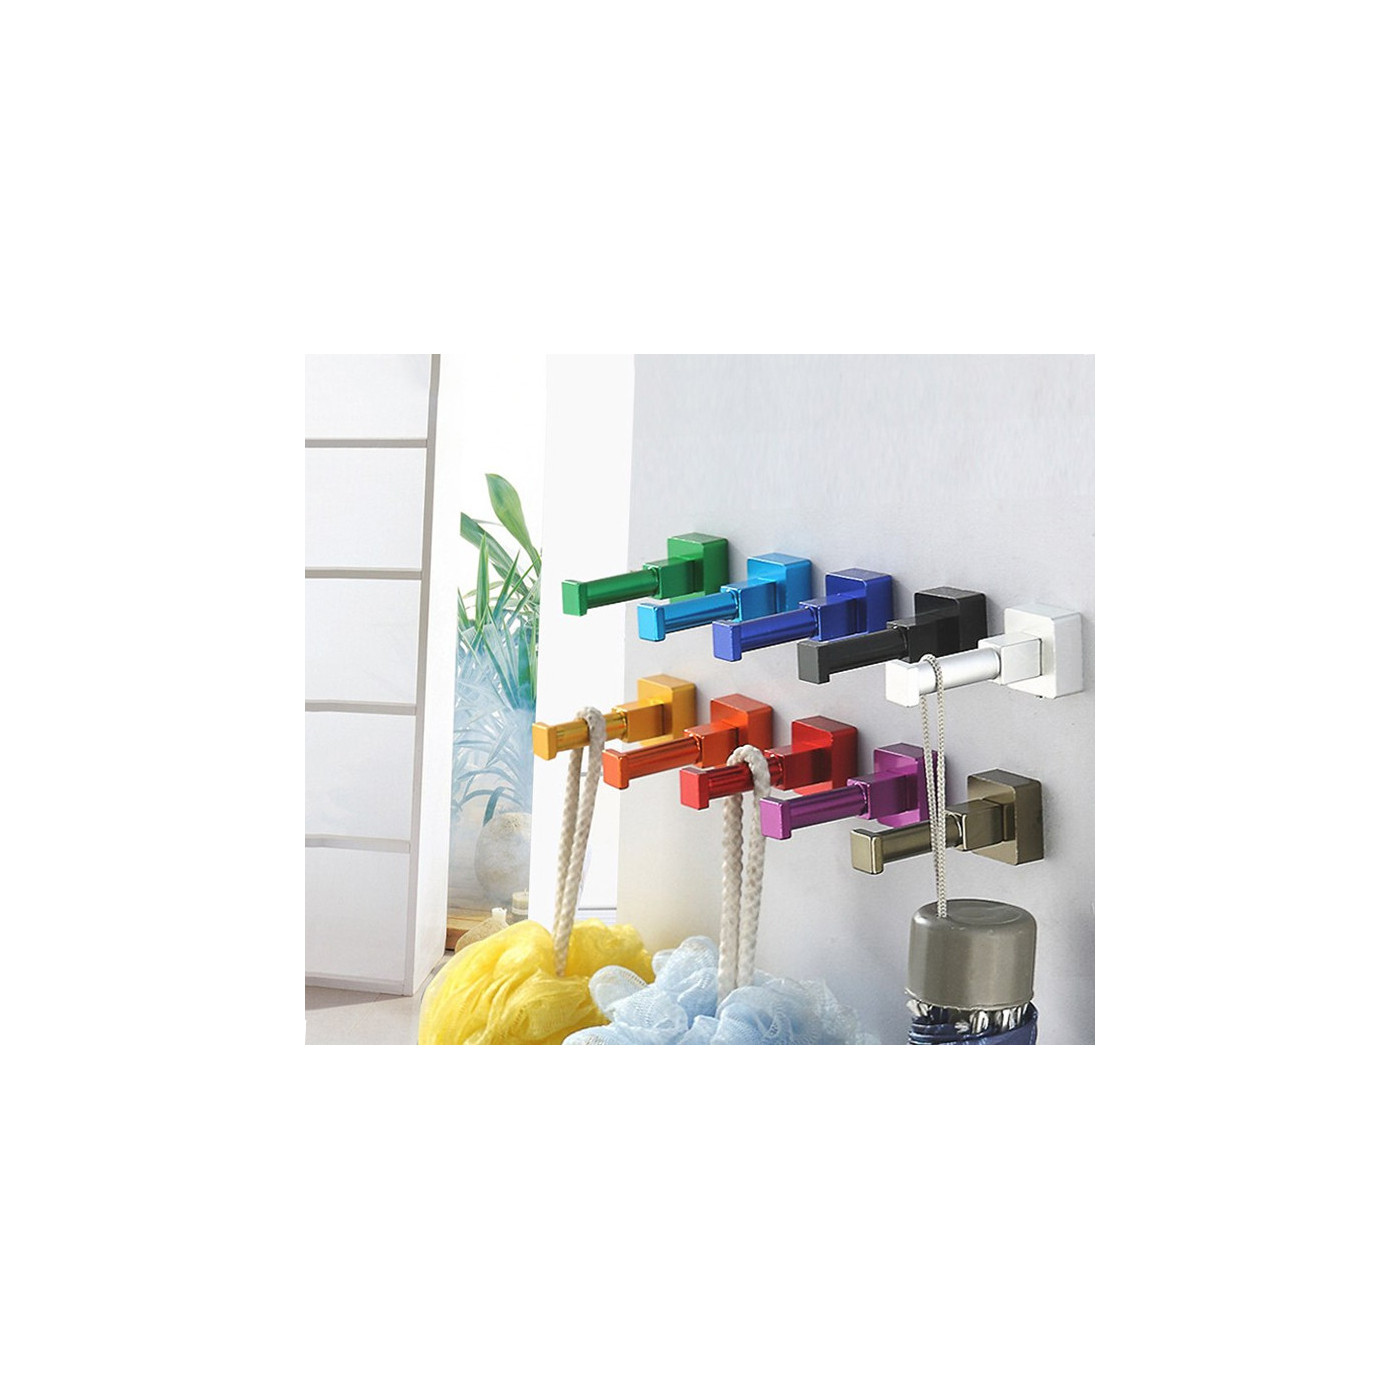 Set van 10 kleurrijke kledinghaken (donkerblauw, vierkant, aluminium)  - 1